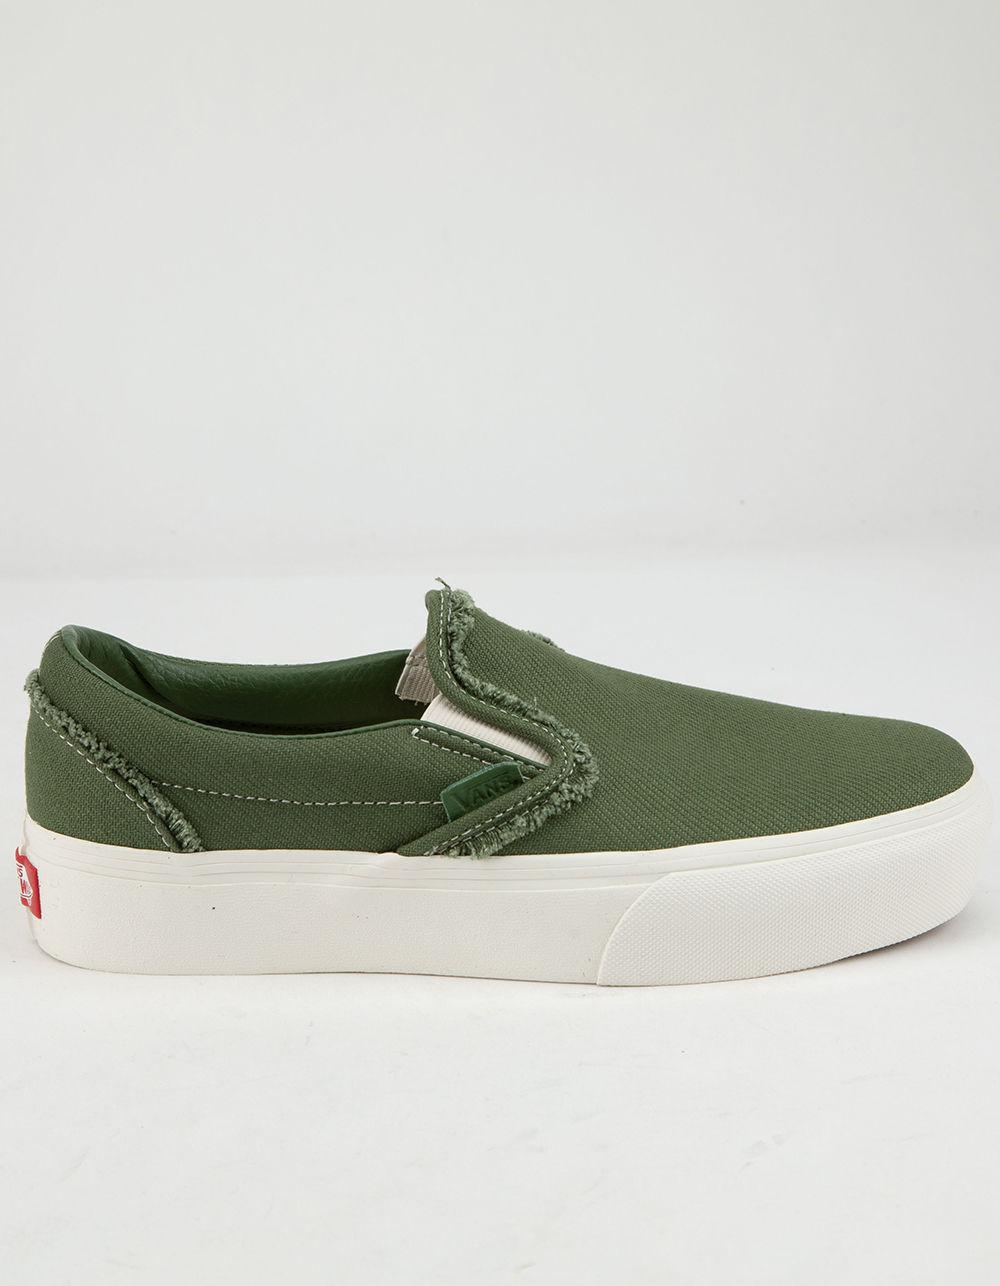 76937505b78 Lyst - Vans Raw Twill Slip-on Platform Garden Green Womens Shoes in ...